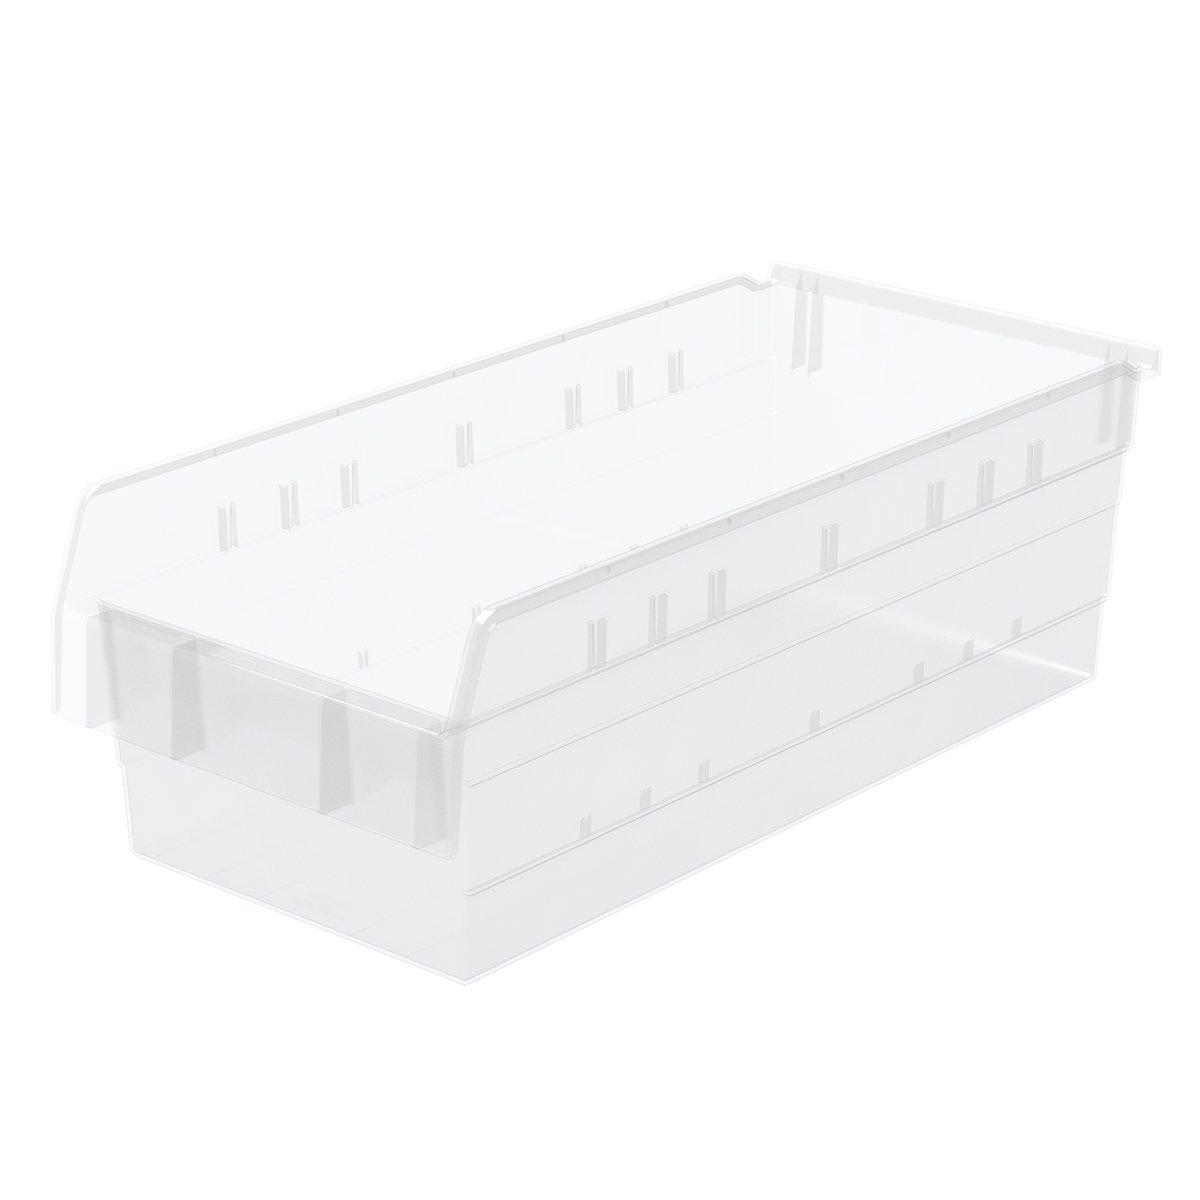 Akro-Mils 30804 ShelfMax 8 Plastic Nesting Shelf Bin Box, 24-Inch x 11-Inch x 8-Inch, Clear, 4-Pack